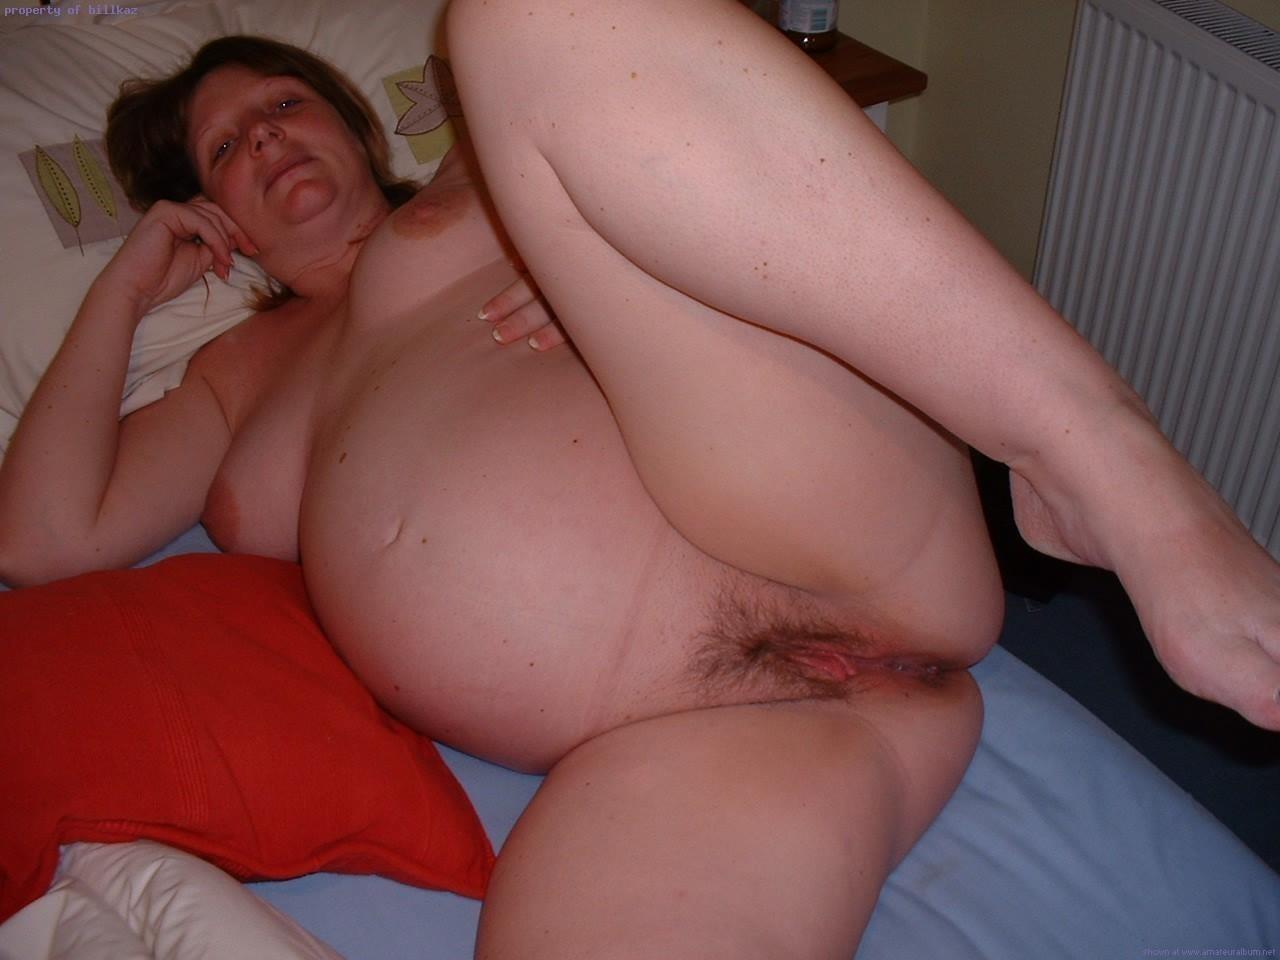 Free mature preggo pics, hot older women